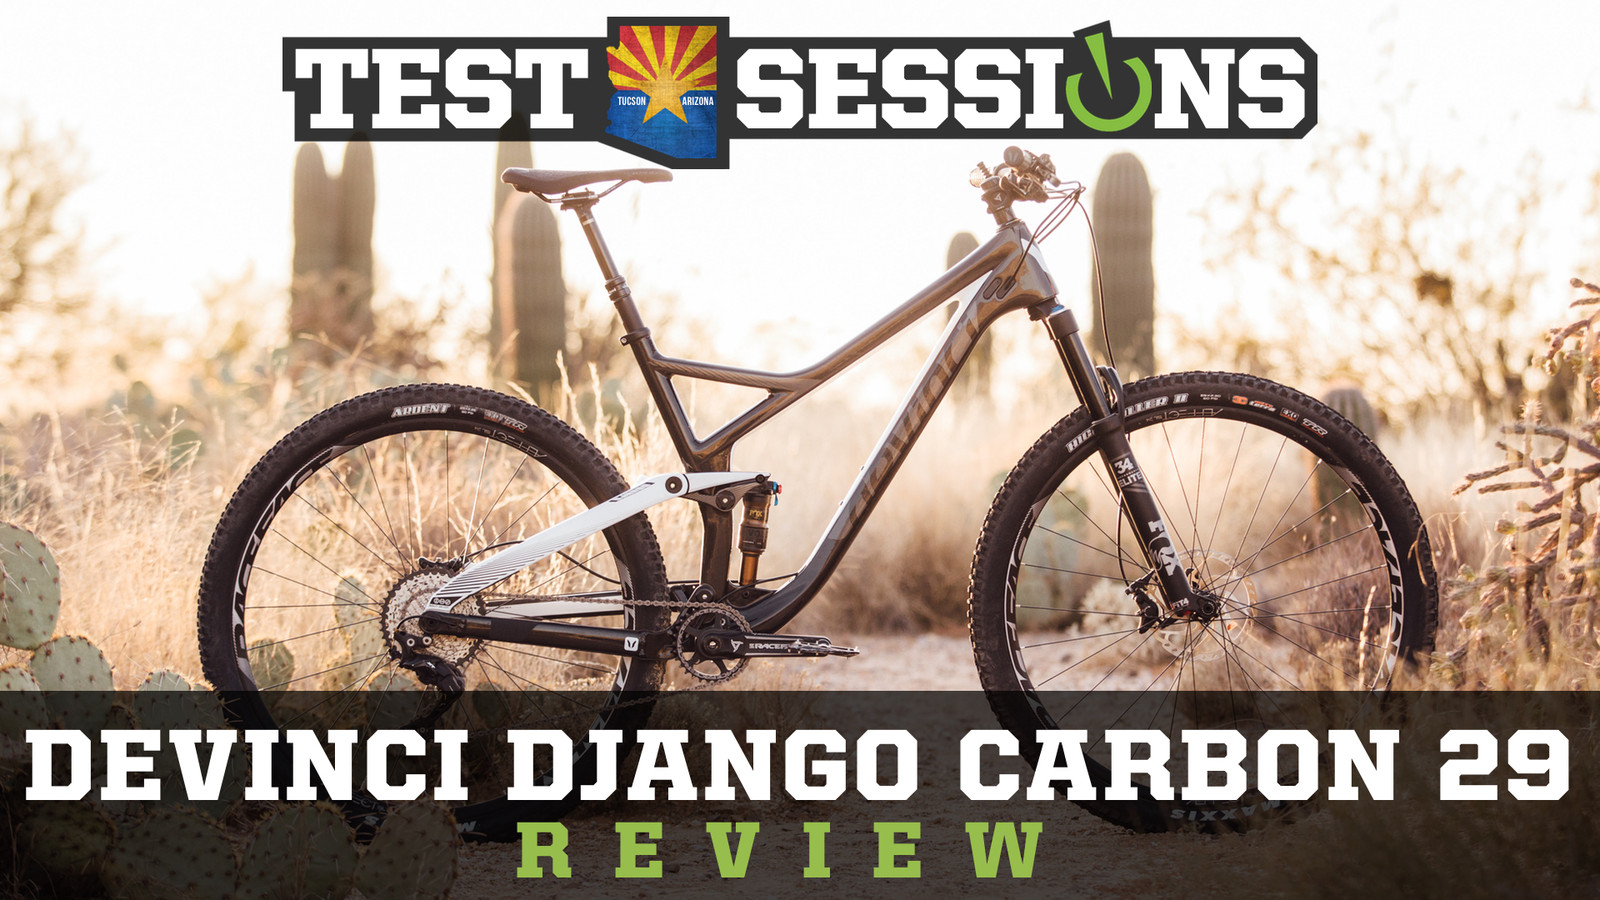 Review - 2017 Devinci Django from Vital MTB Test Sessions